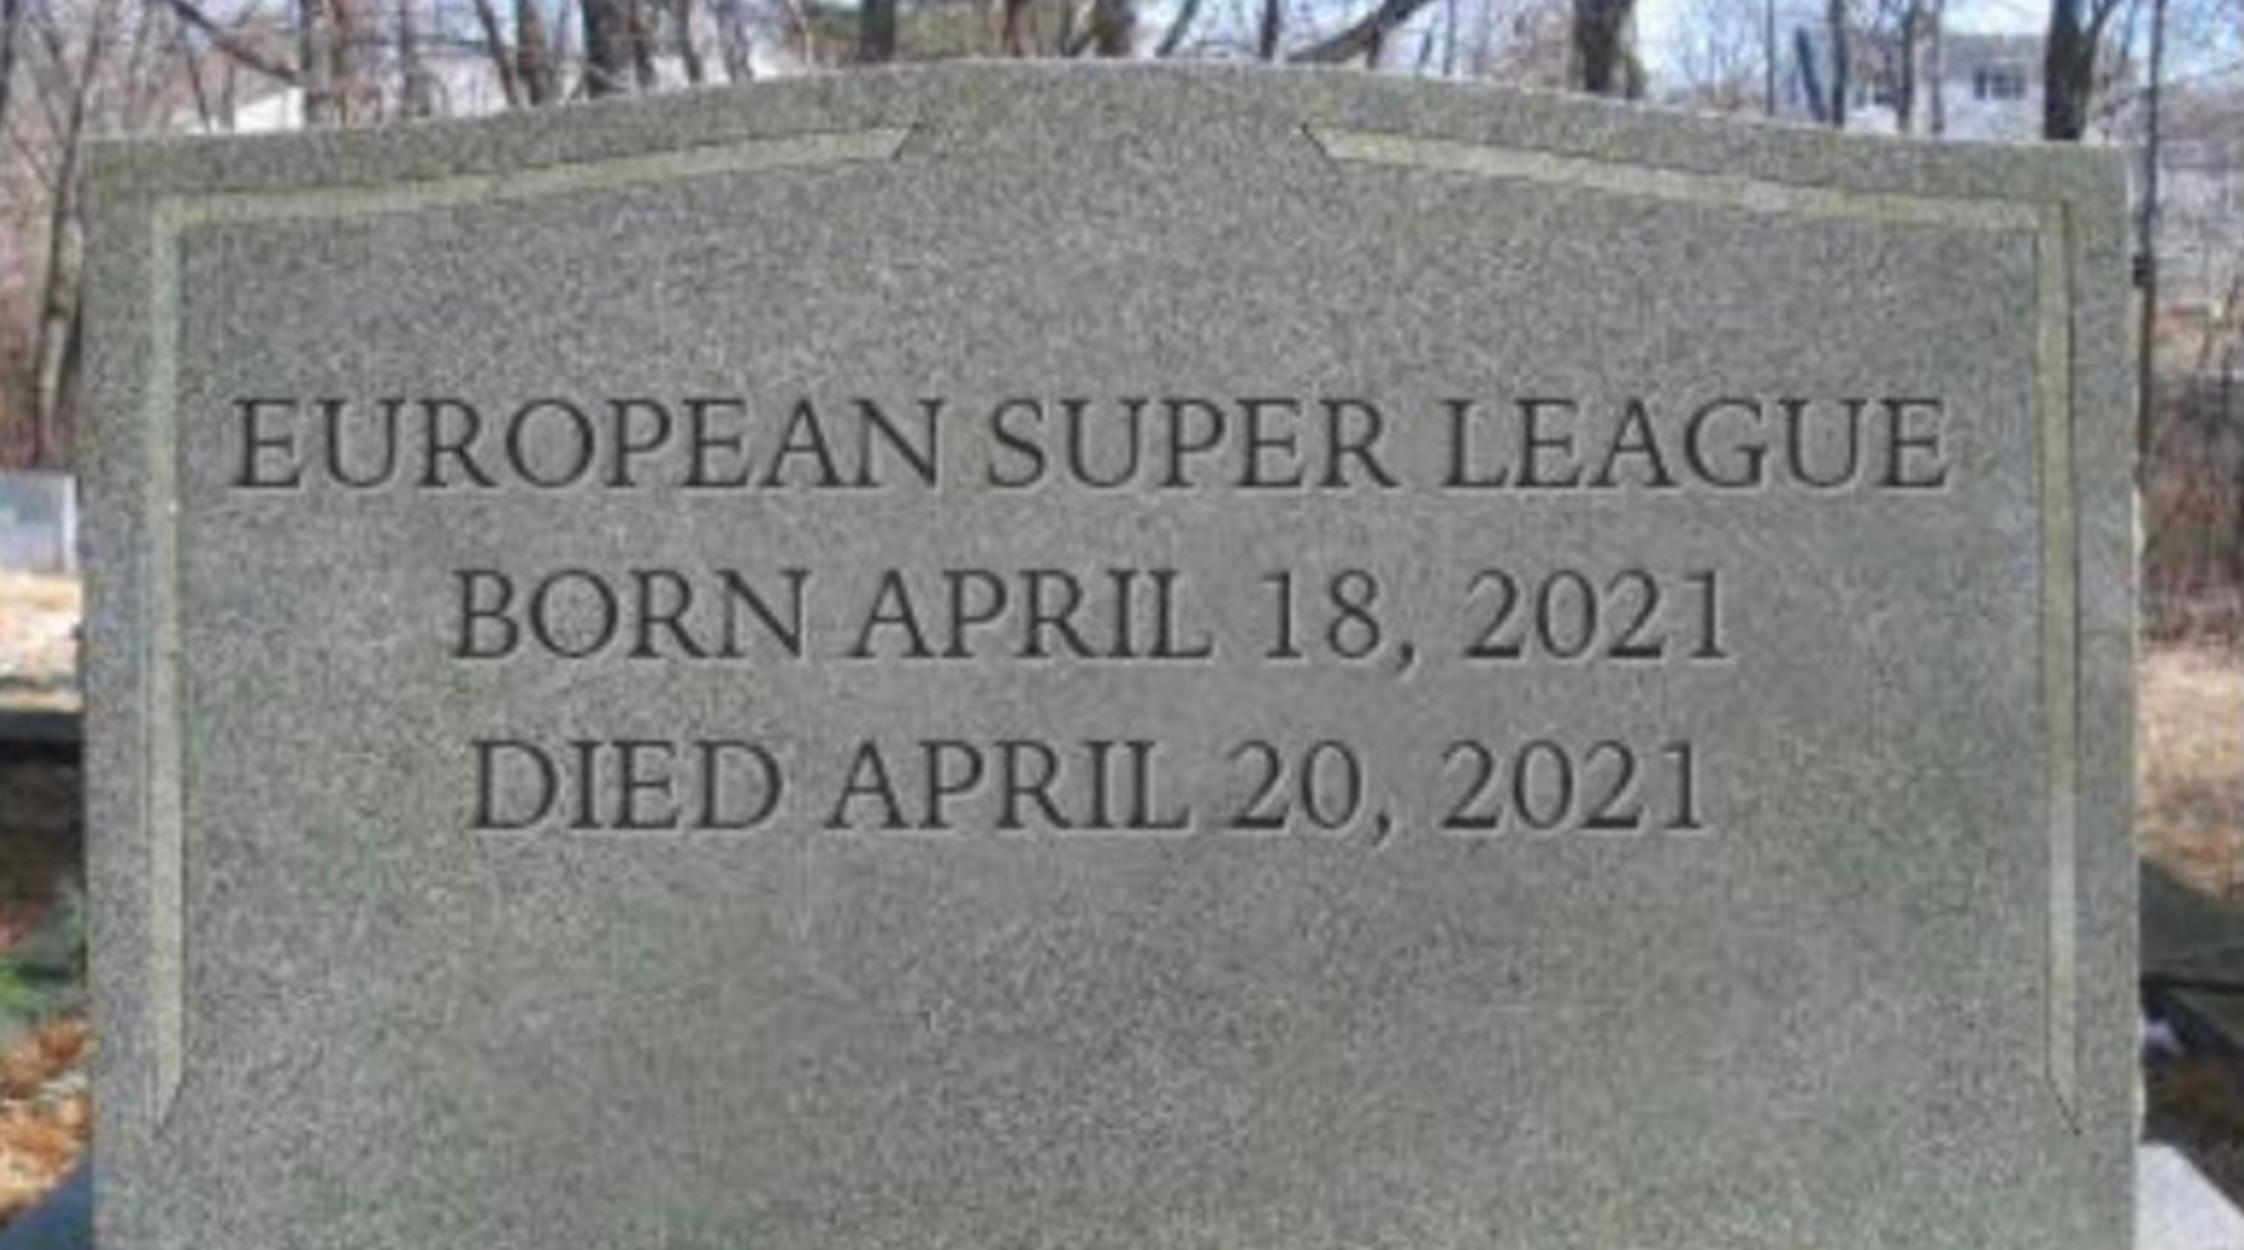 European Super League: Κατάρρευση! Αποχώρησαν οι 6 αγγλικές ομάδες και ανακοινώθηκε «πάγωμα»